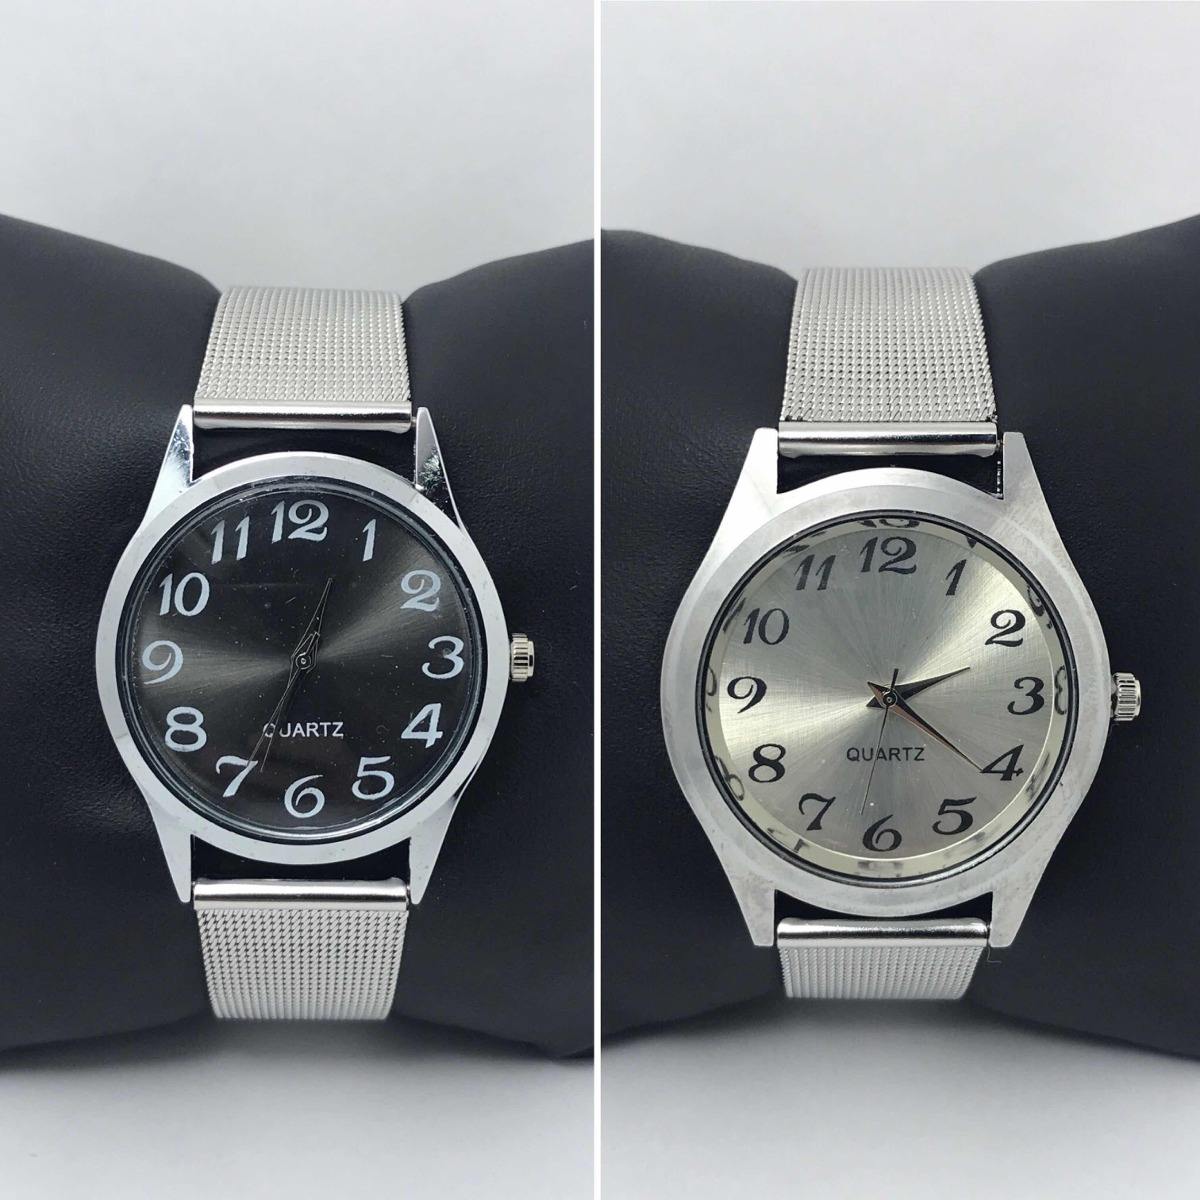 1b2670f8ea65 reloj mujer metalico mejor precio ¡ super oferta ! stock ya! Cargando zoom.